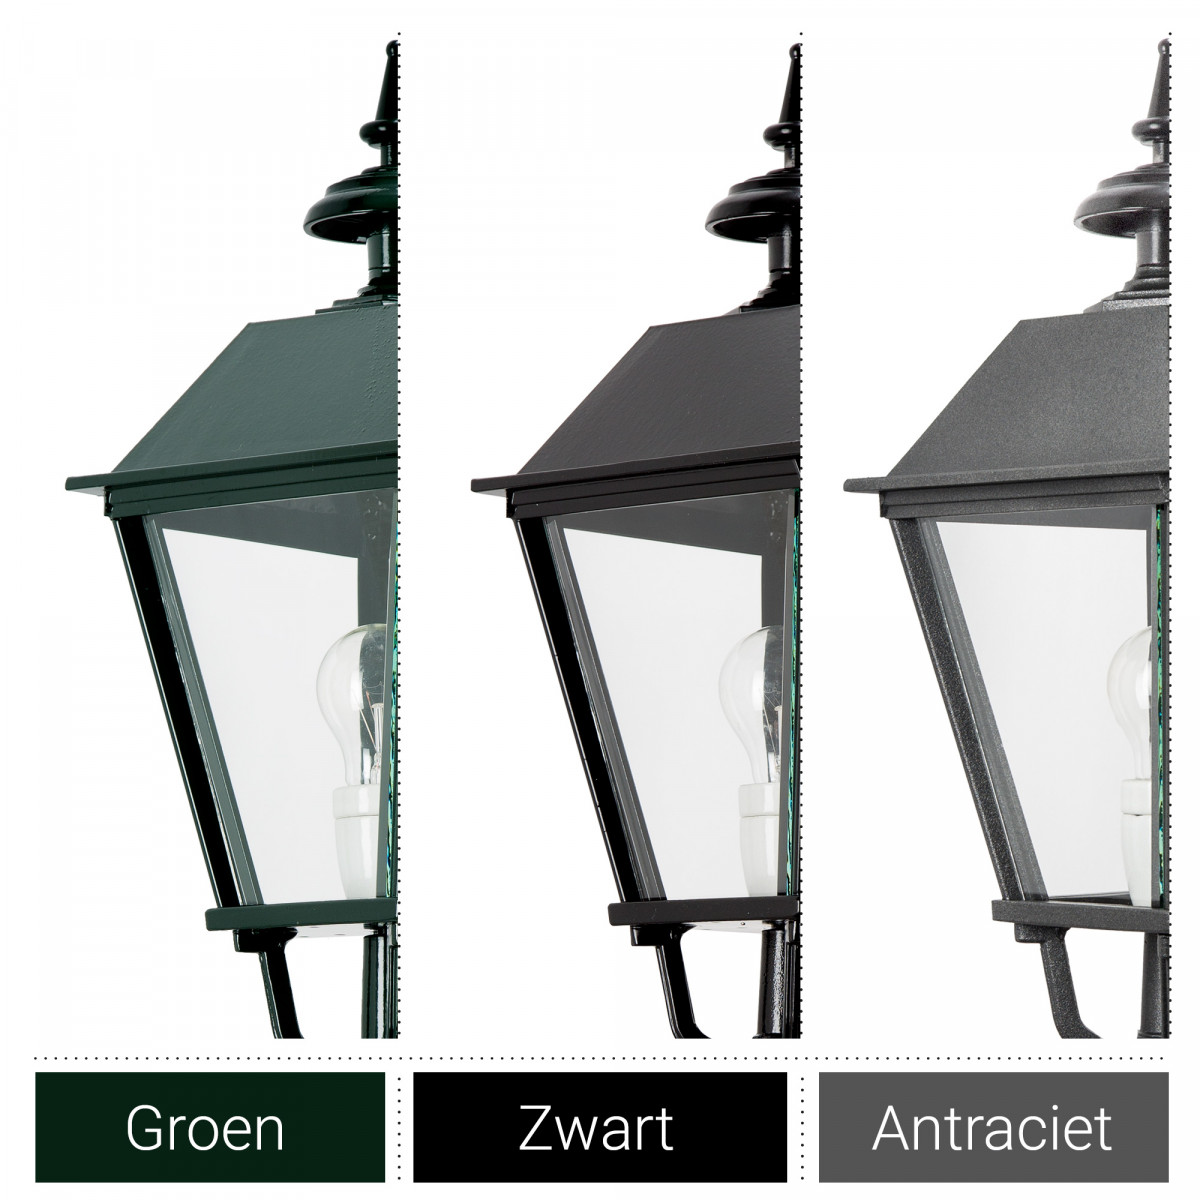 Buitenlamp Zeskant - M 38 Dag Nacht sensor LED Schemersensor